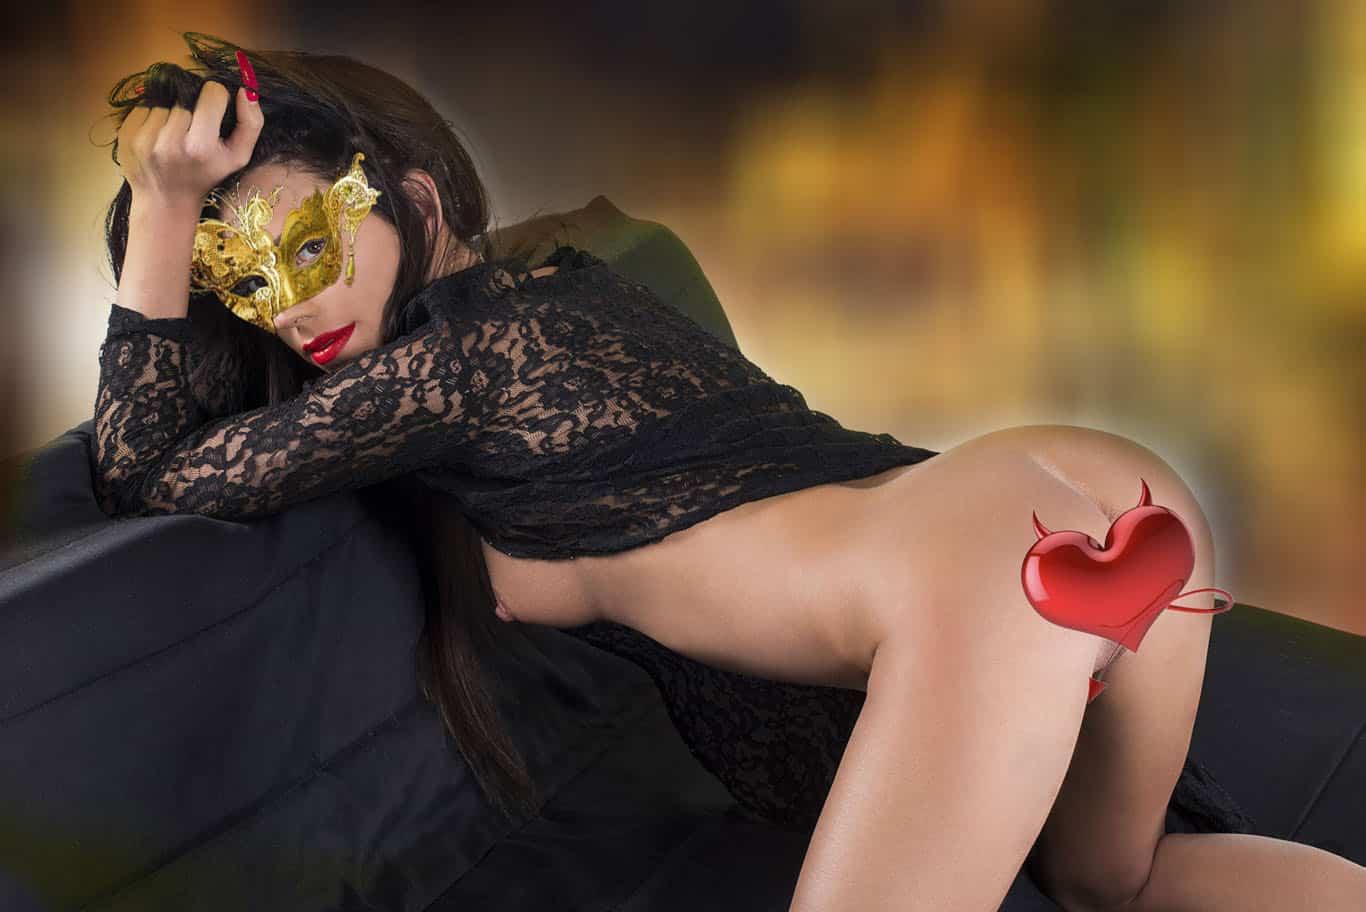 dreamgirls-best-models-escorts-crystal